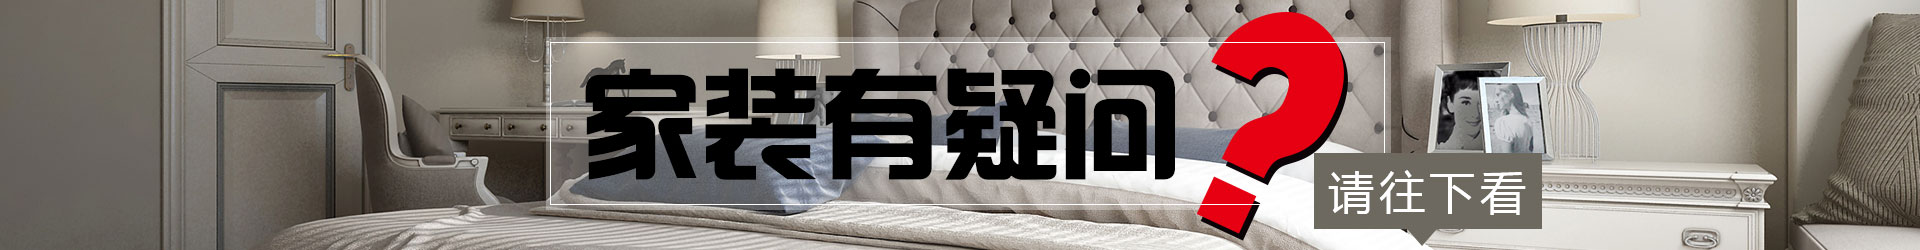 优惠活动、家装指南banner